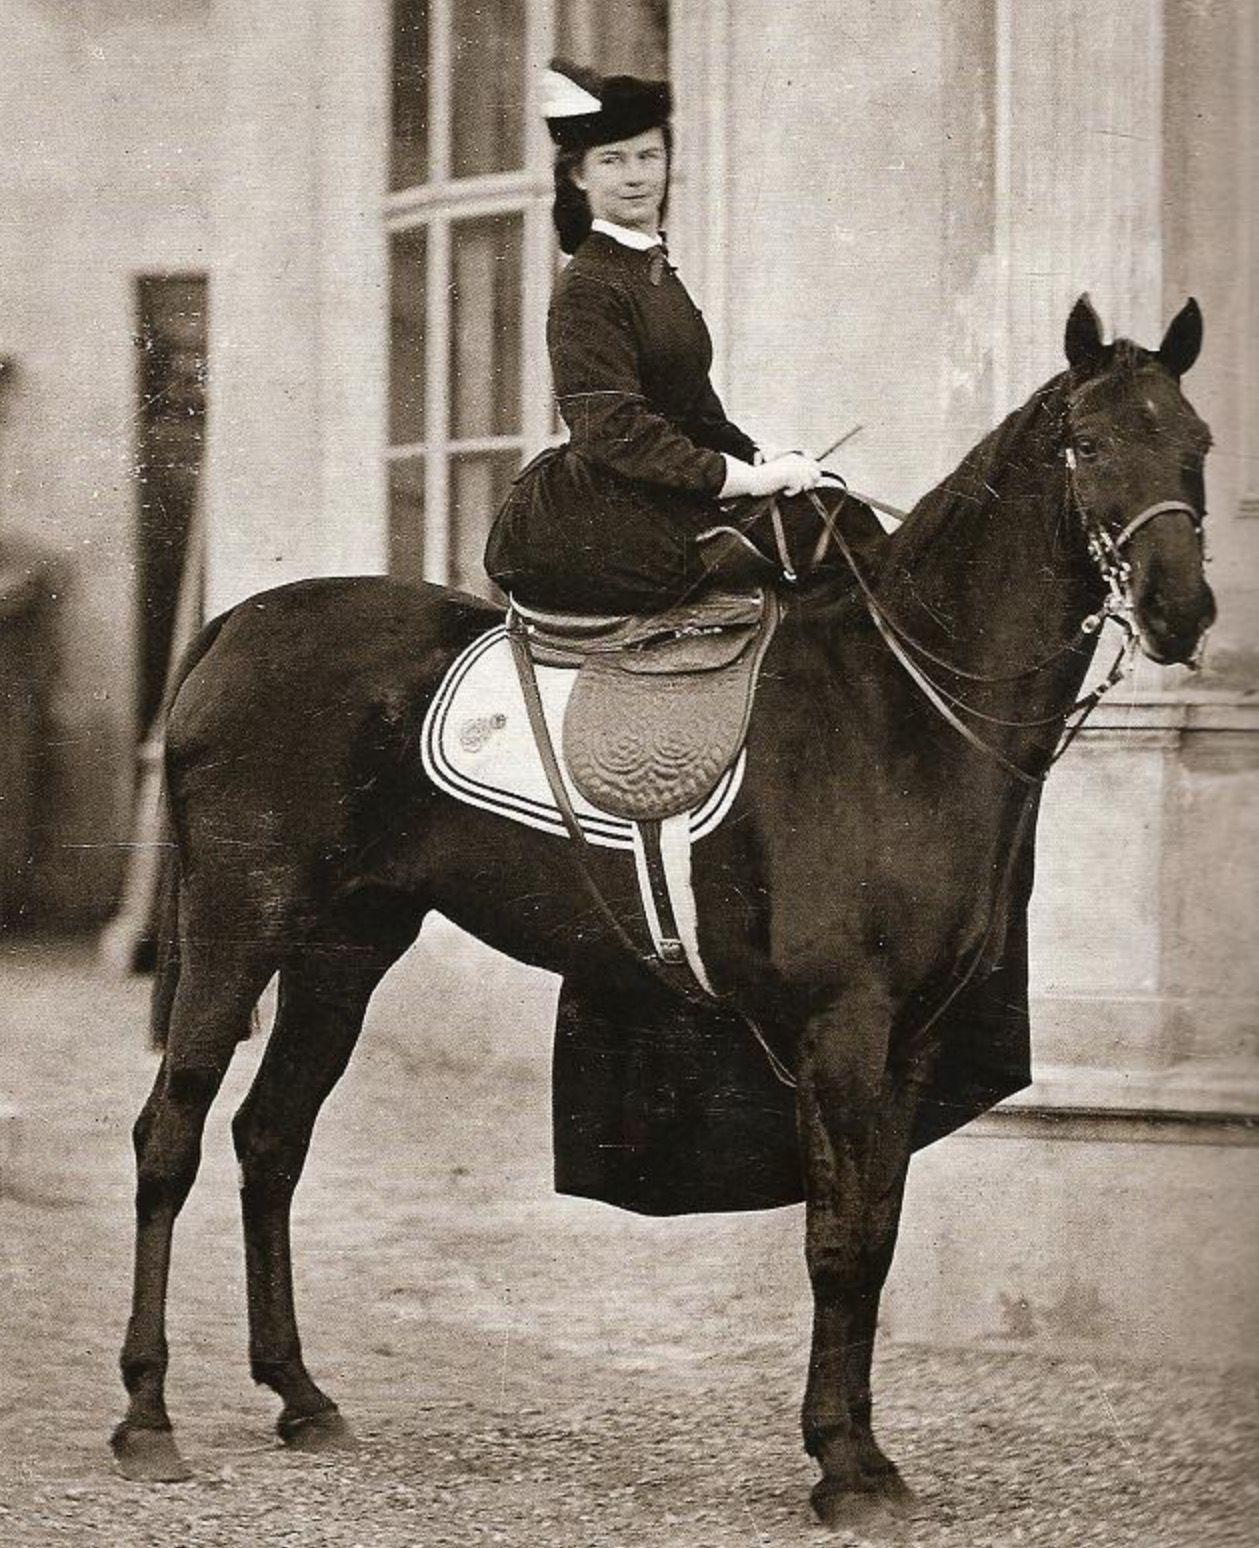 La emperatriz Sissi, cuñada de Carlota. | Sissi, Carlota's sister in law.